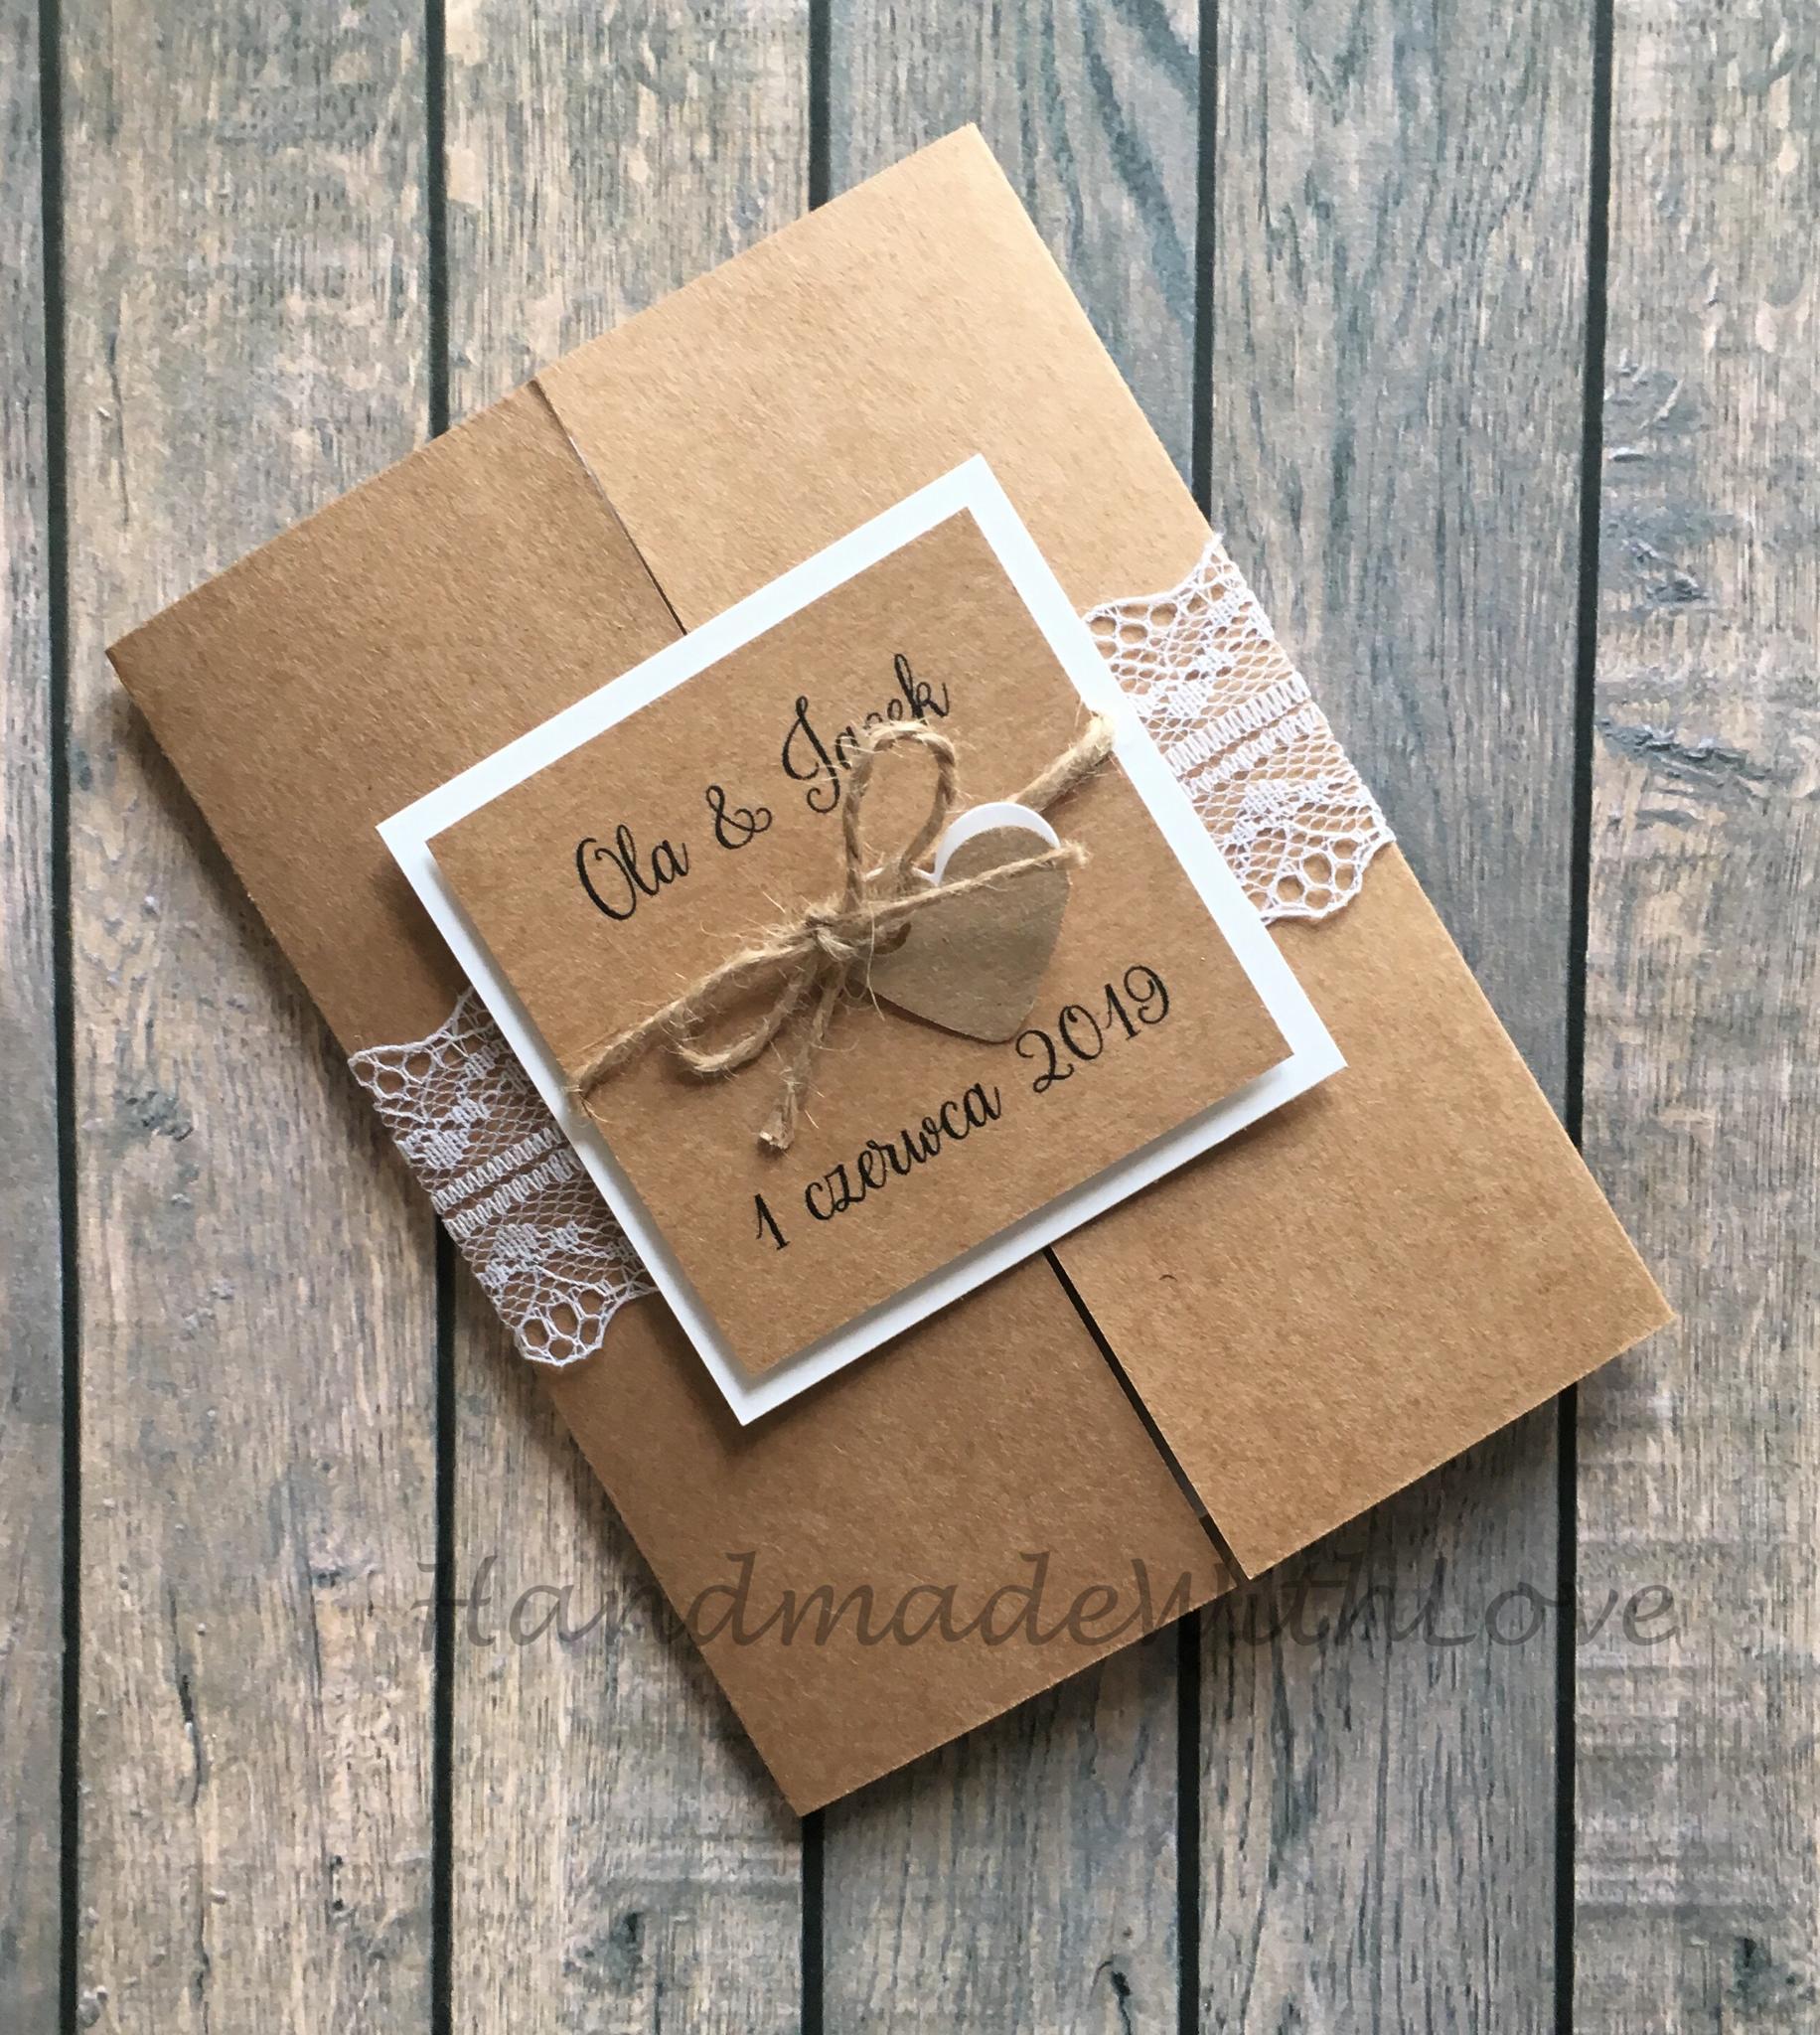 Pin by hunnypotmade on my handmade wedding invitations pinterest